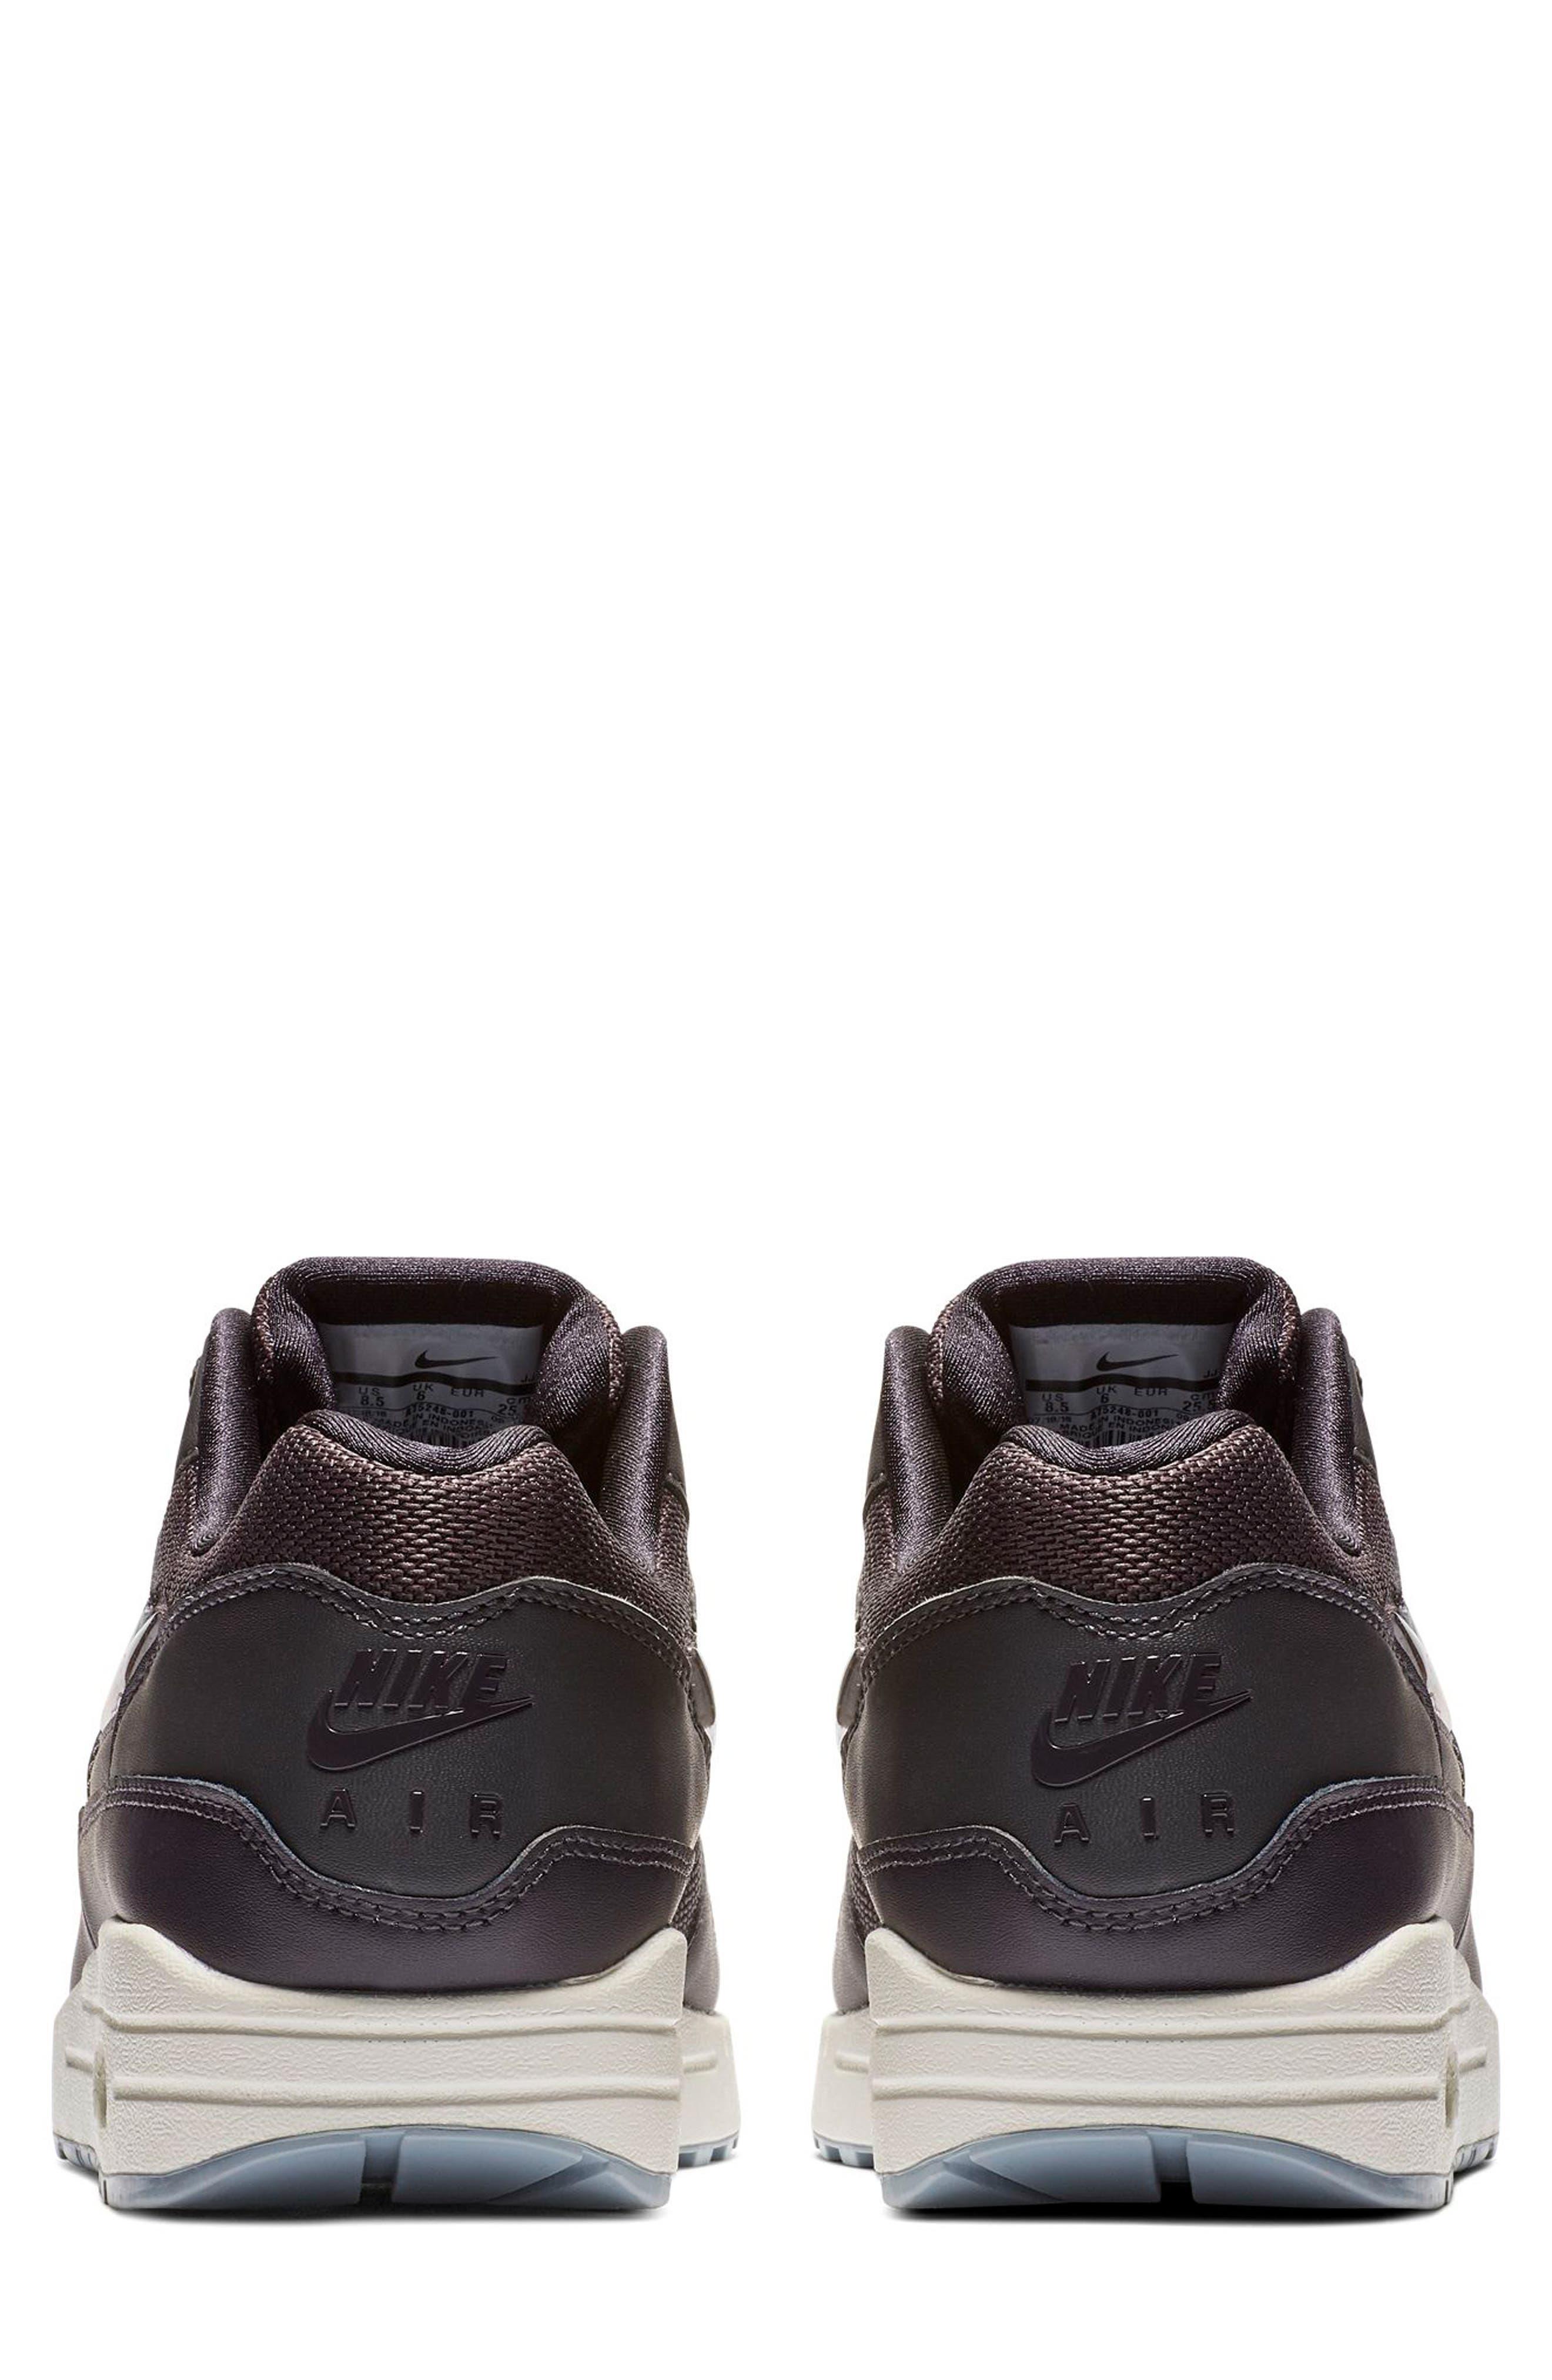 NIKE, Air Max 1 JP Sneaker, Alternate thumbnail 2, color, OIL GREY/ OBSIDIAN/ WHITE